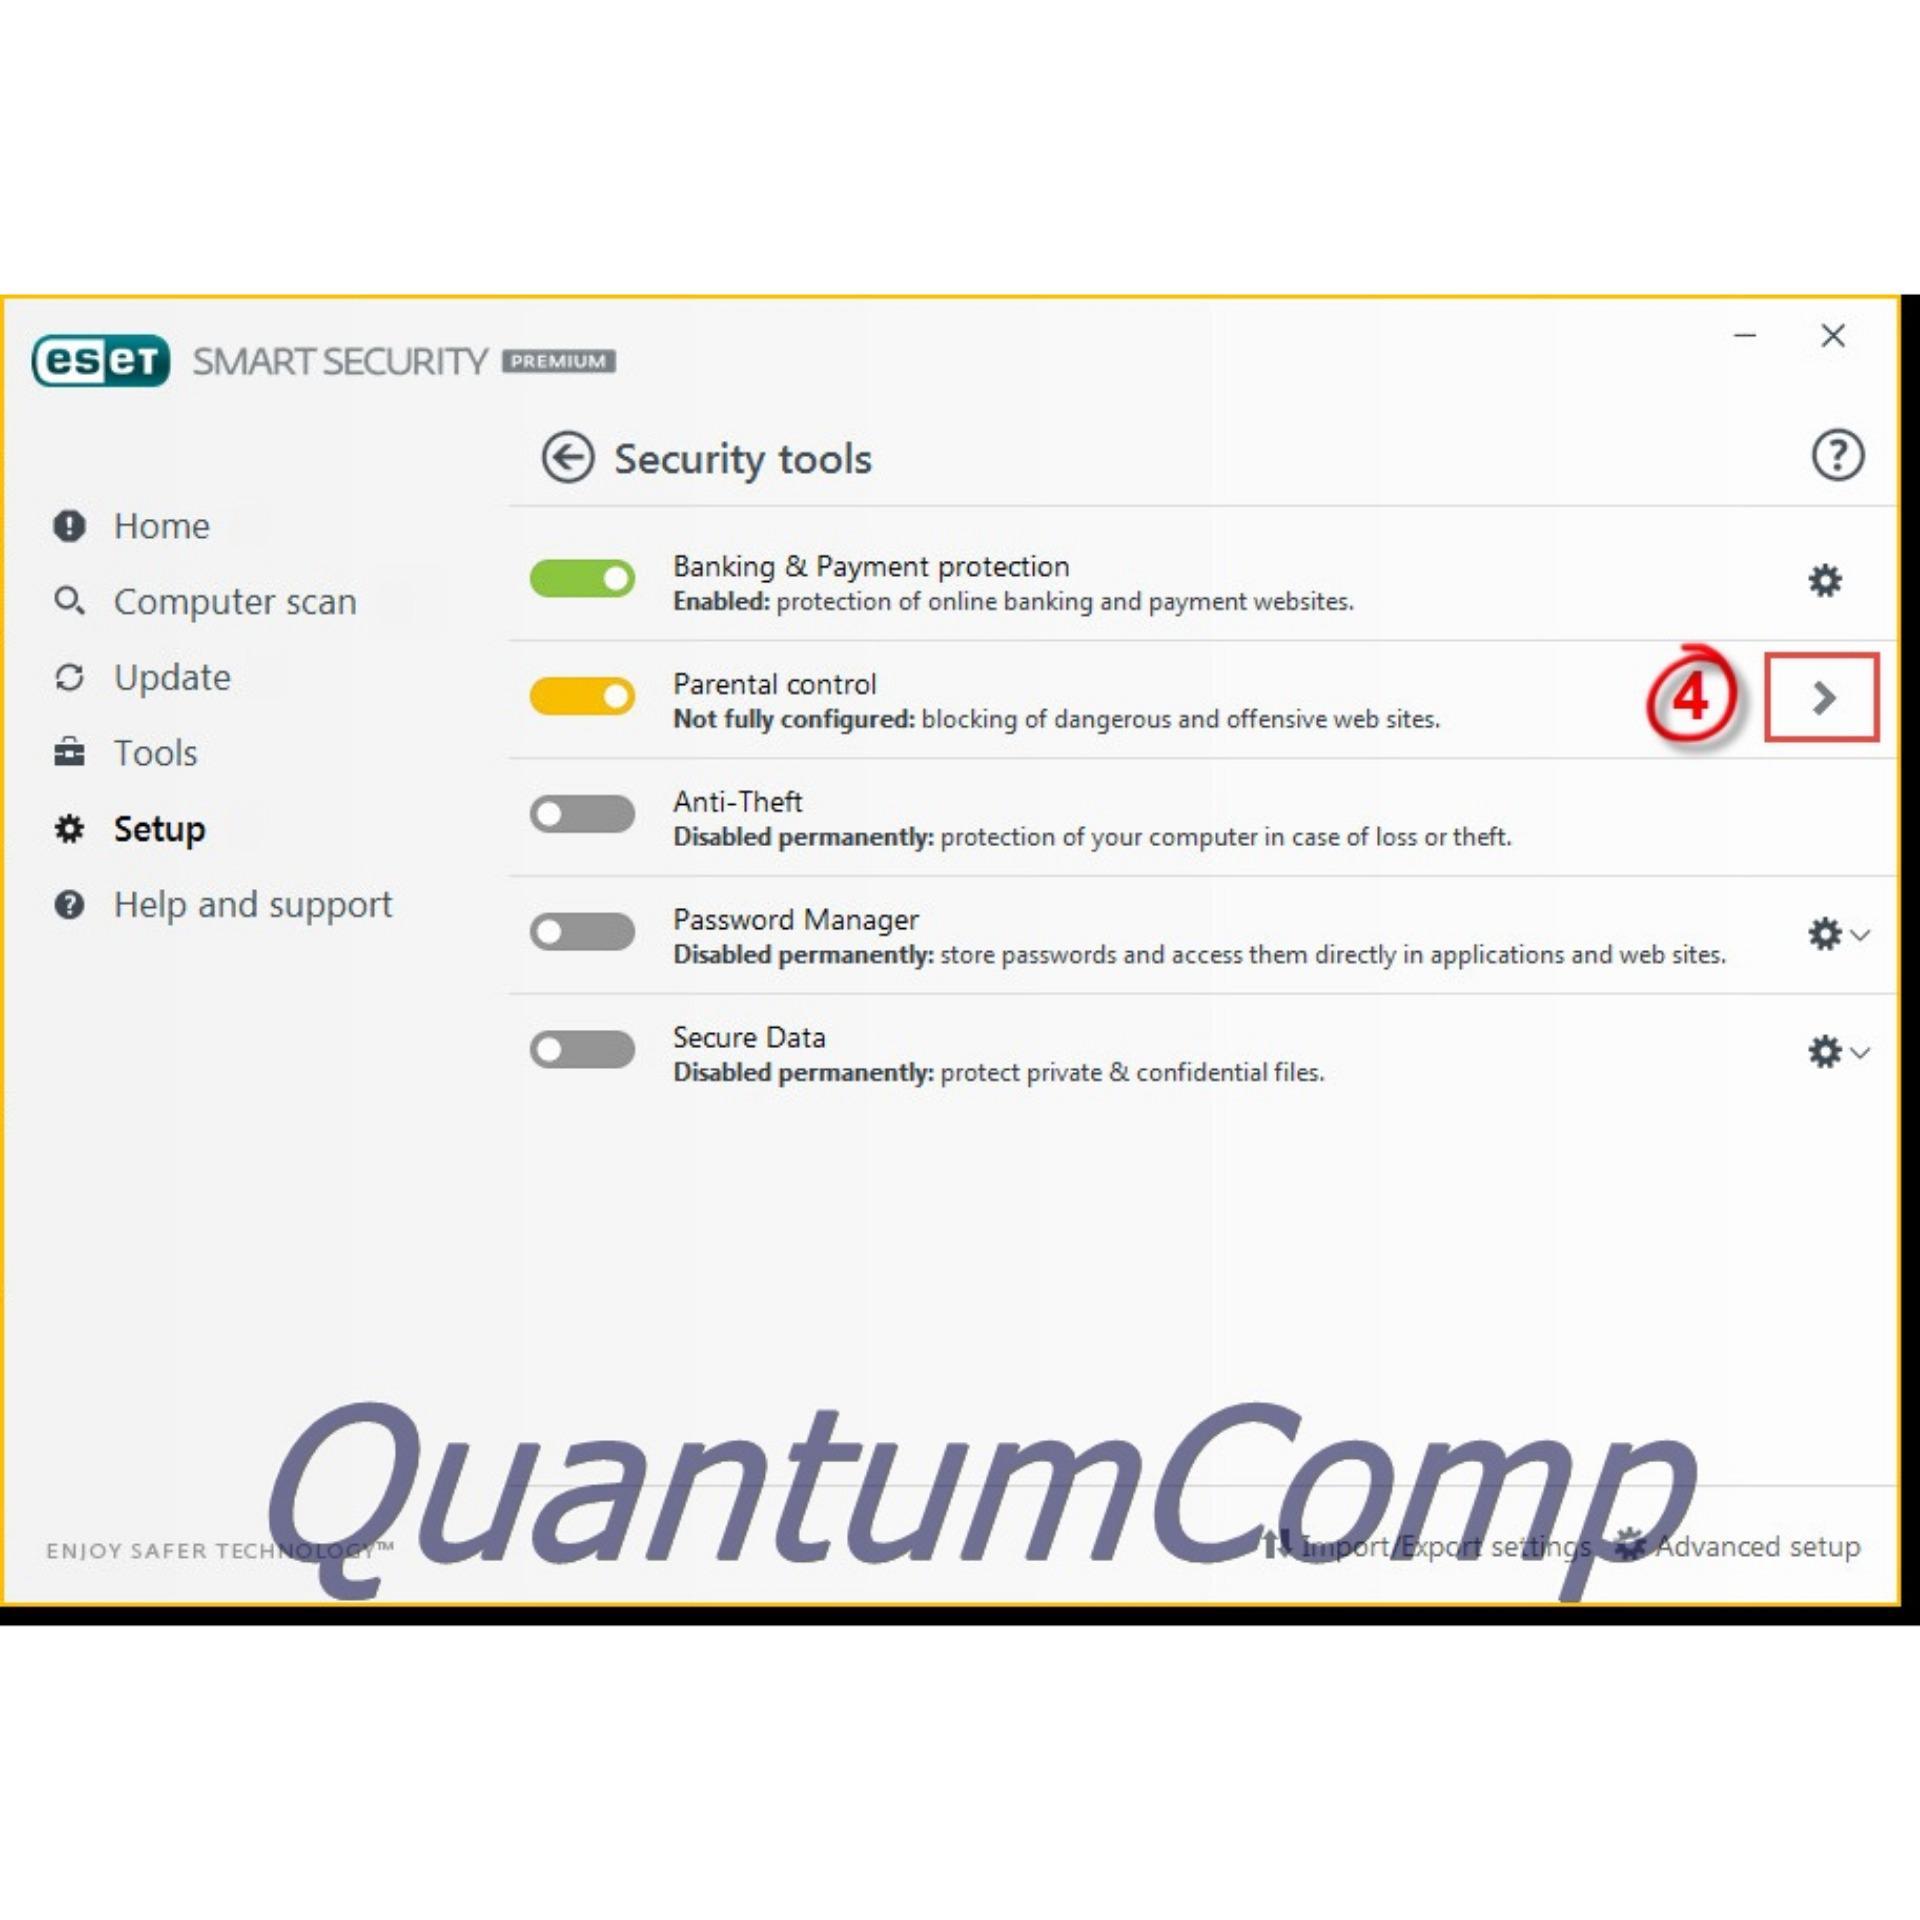 Harga Penawaran Antivirus Eset Smart Security Premium 10 1 Pc Anti Virus Mcafee Internet 3 Tahun User